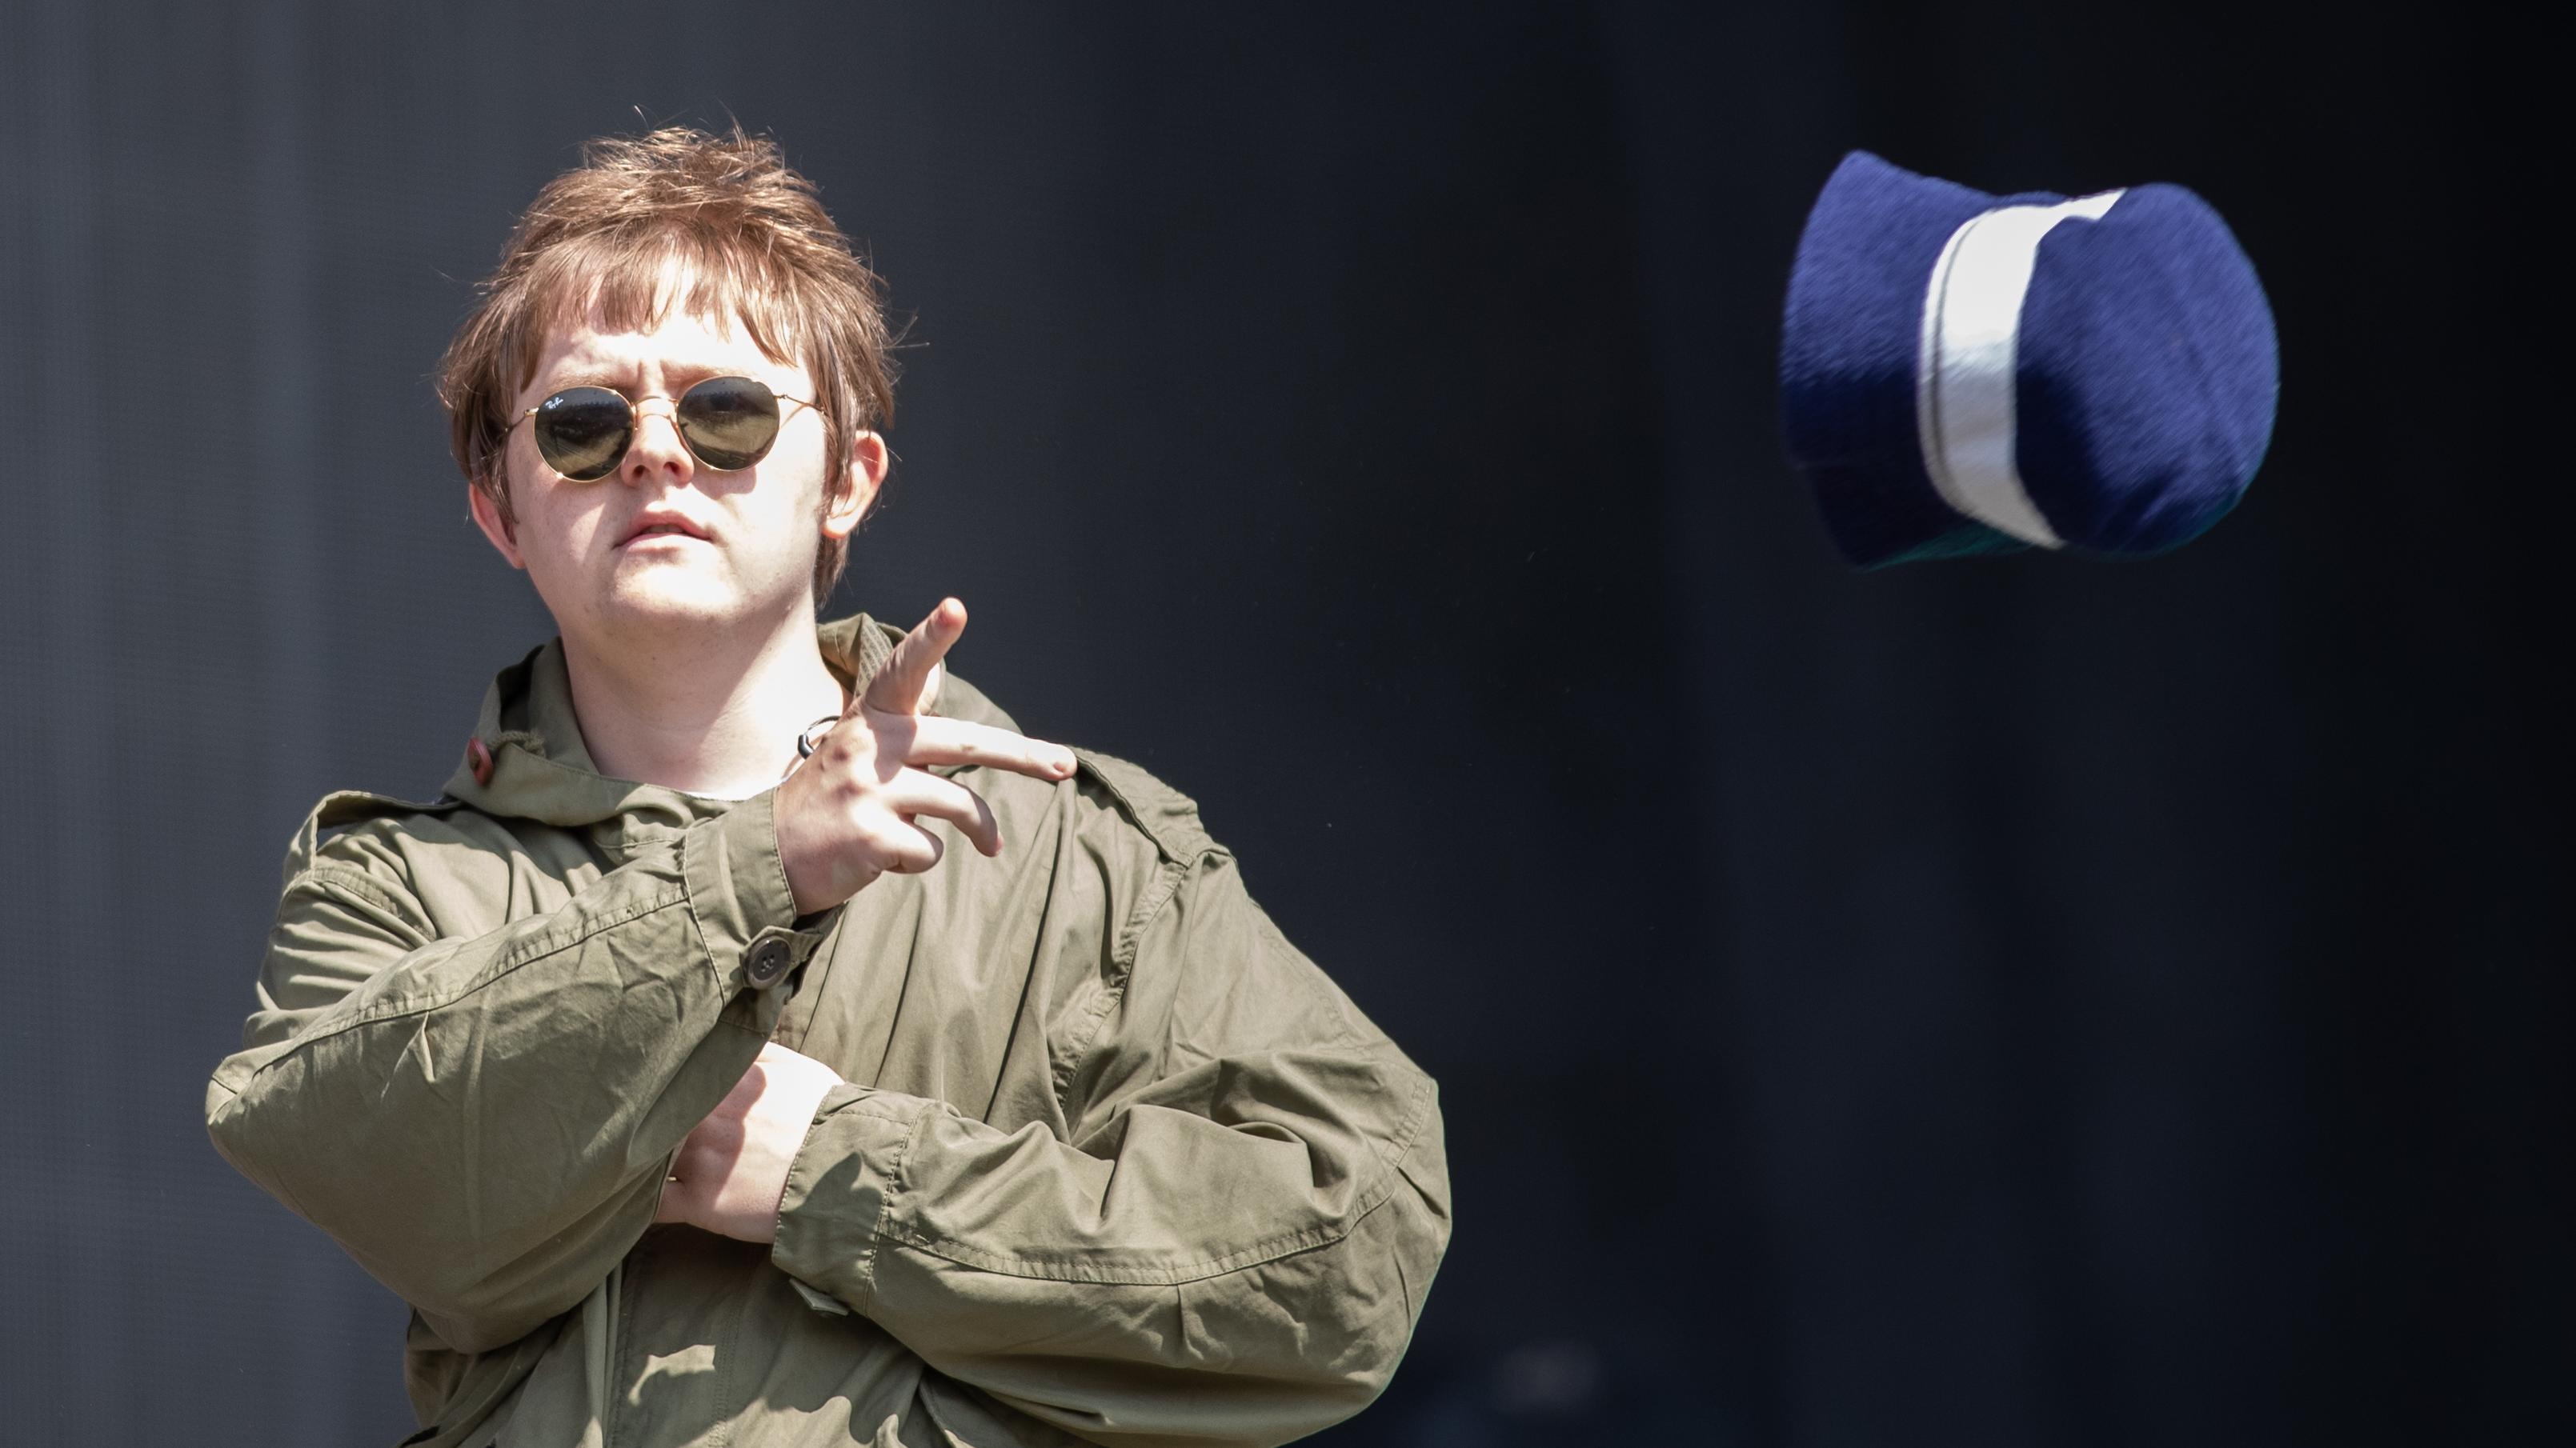 Lewis Capaldi Trolls Noel Gallagher During Intro To His Glastonbury Set. Credit: PA